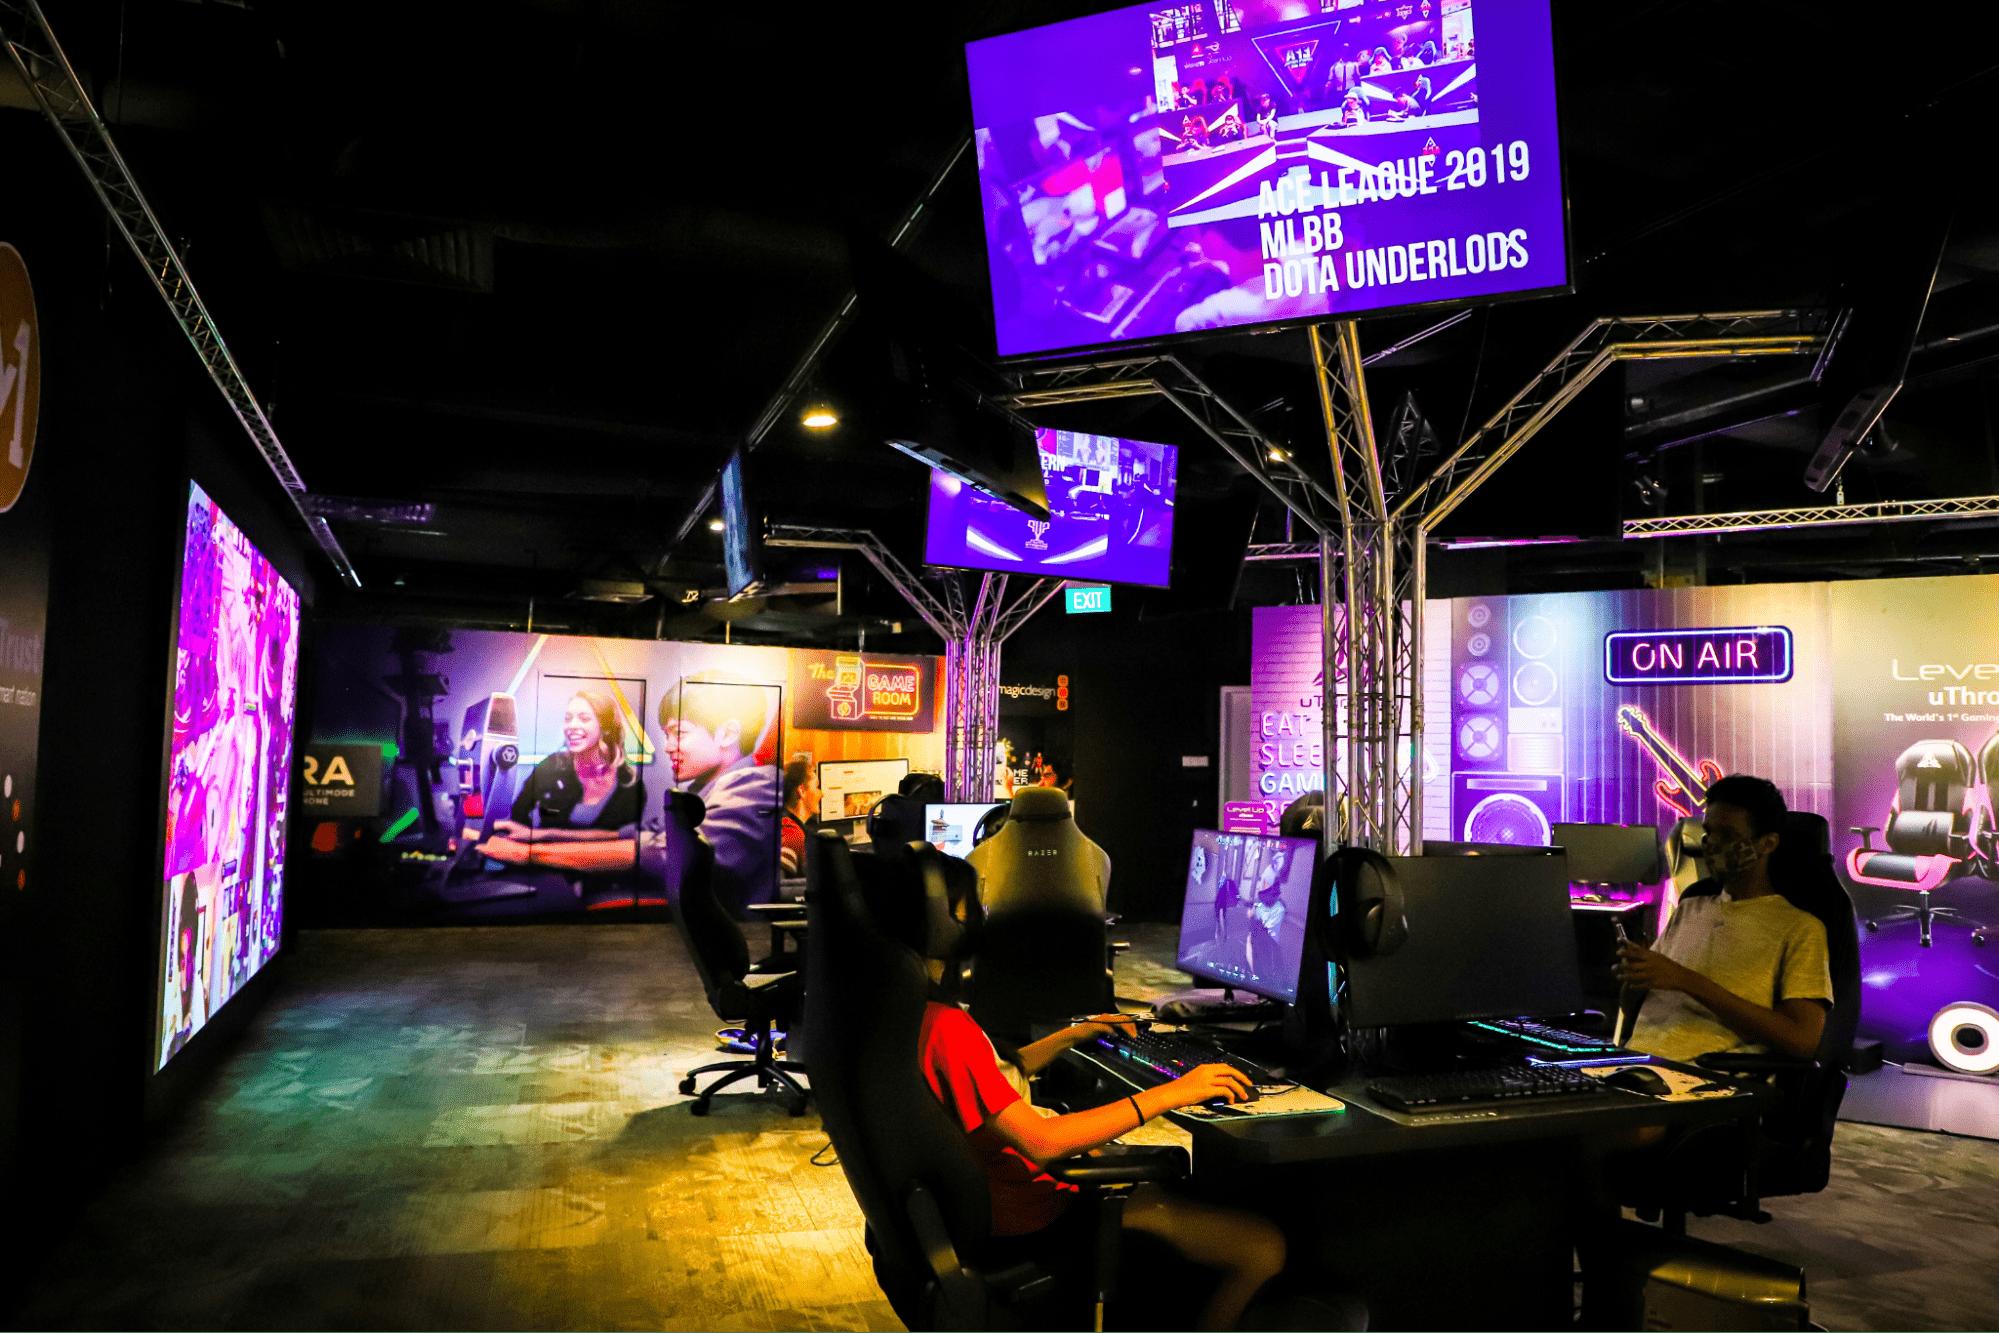 Esports experience centre - LAN